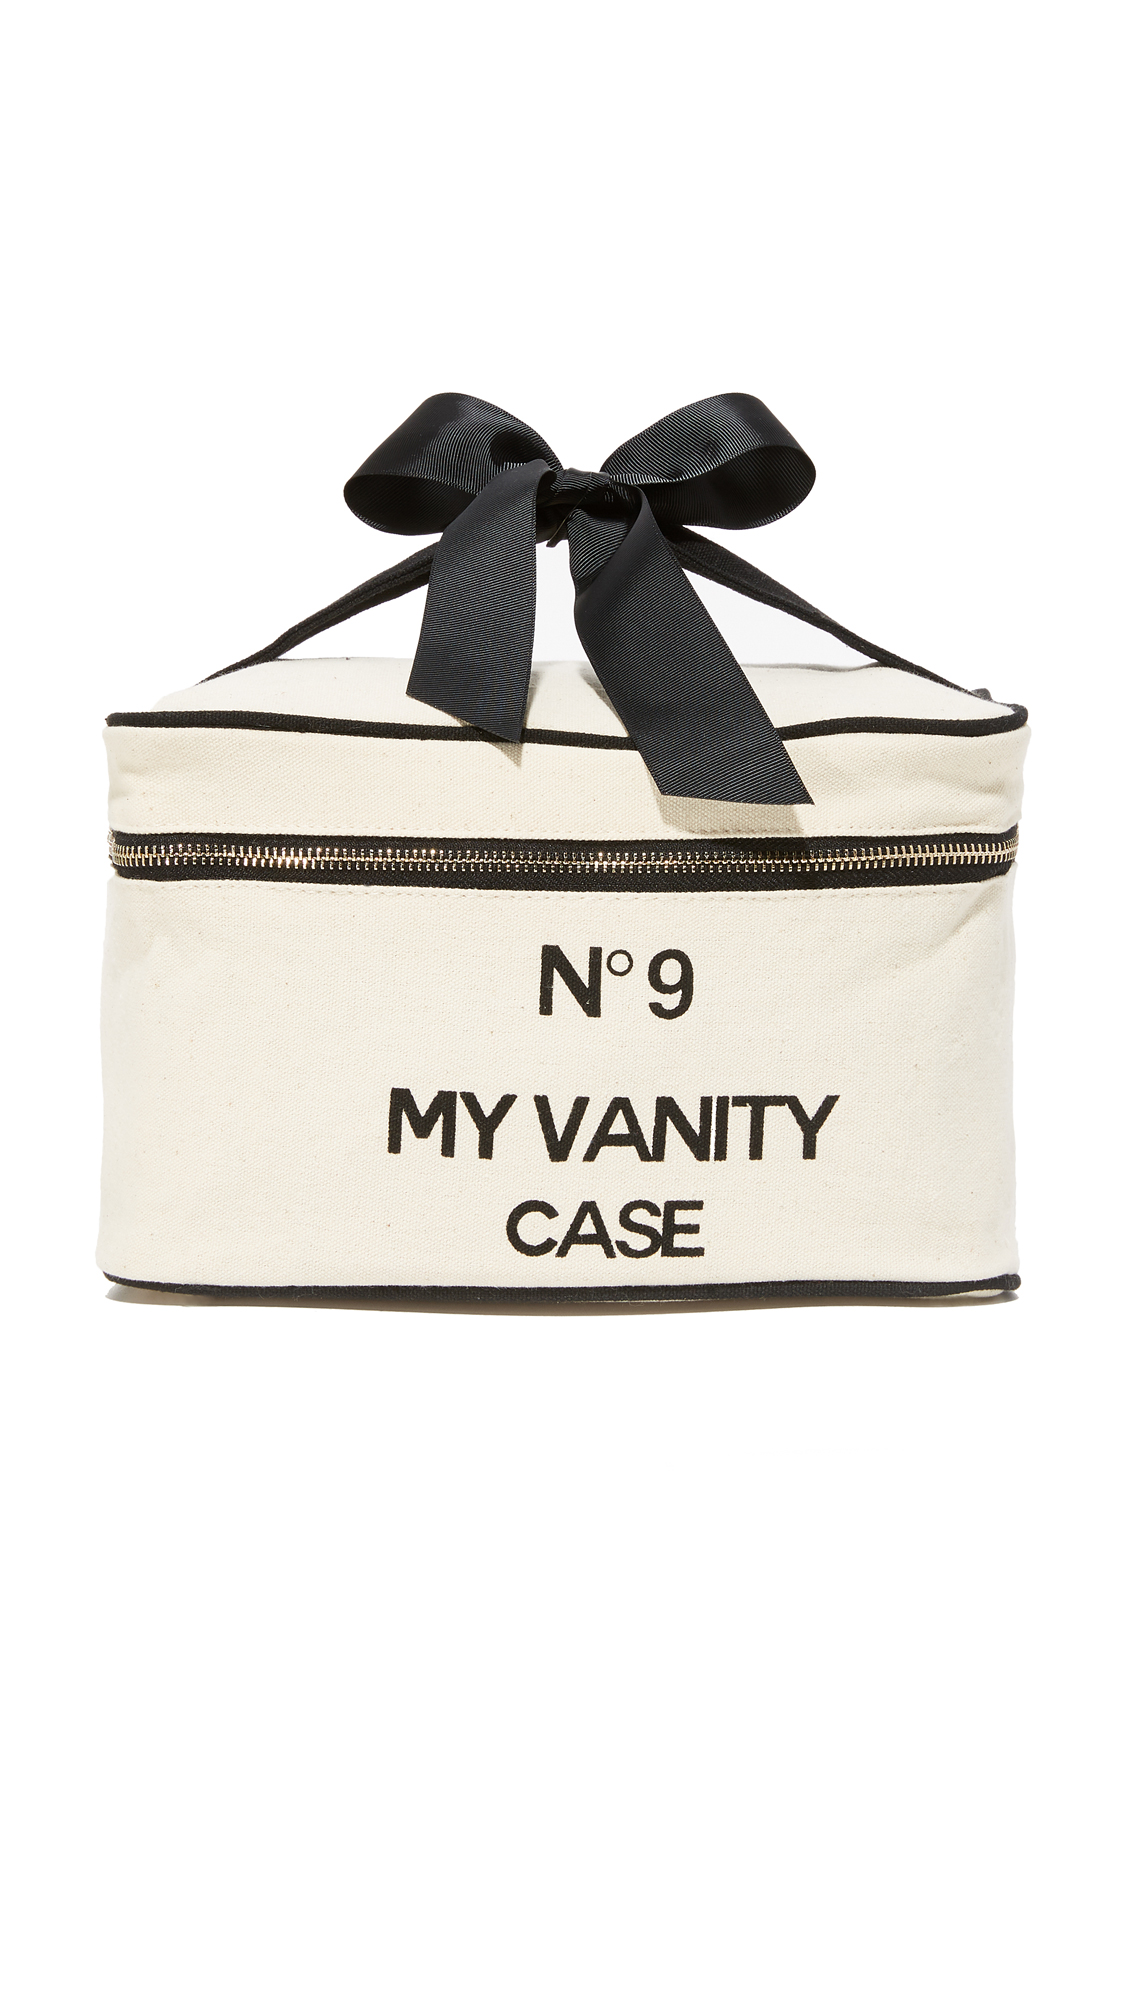 Bag-all My Vanity Travel Case - Natural/Black